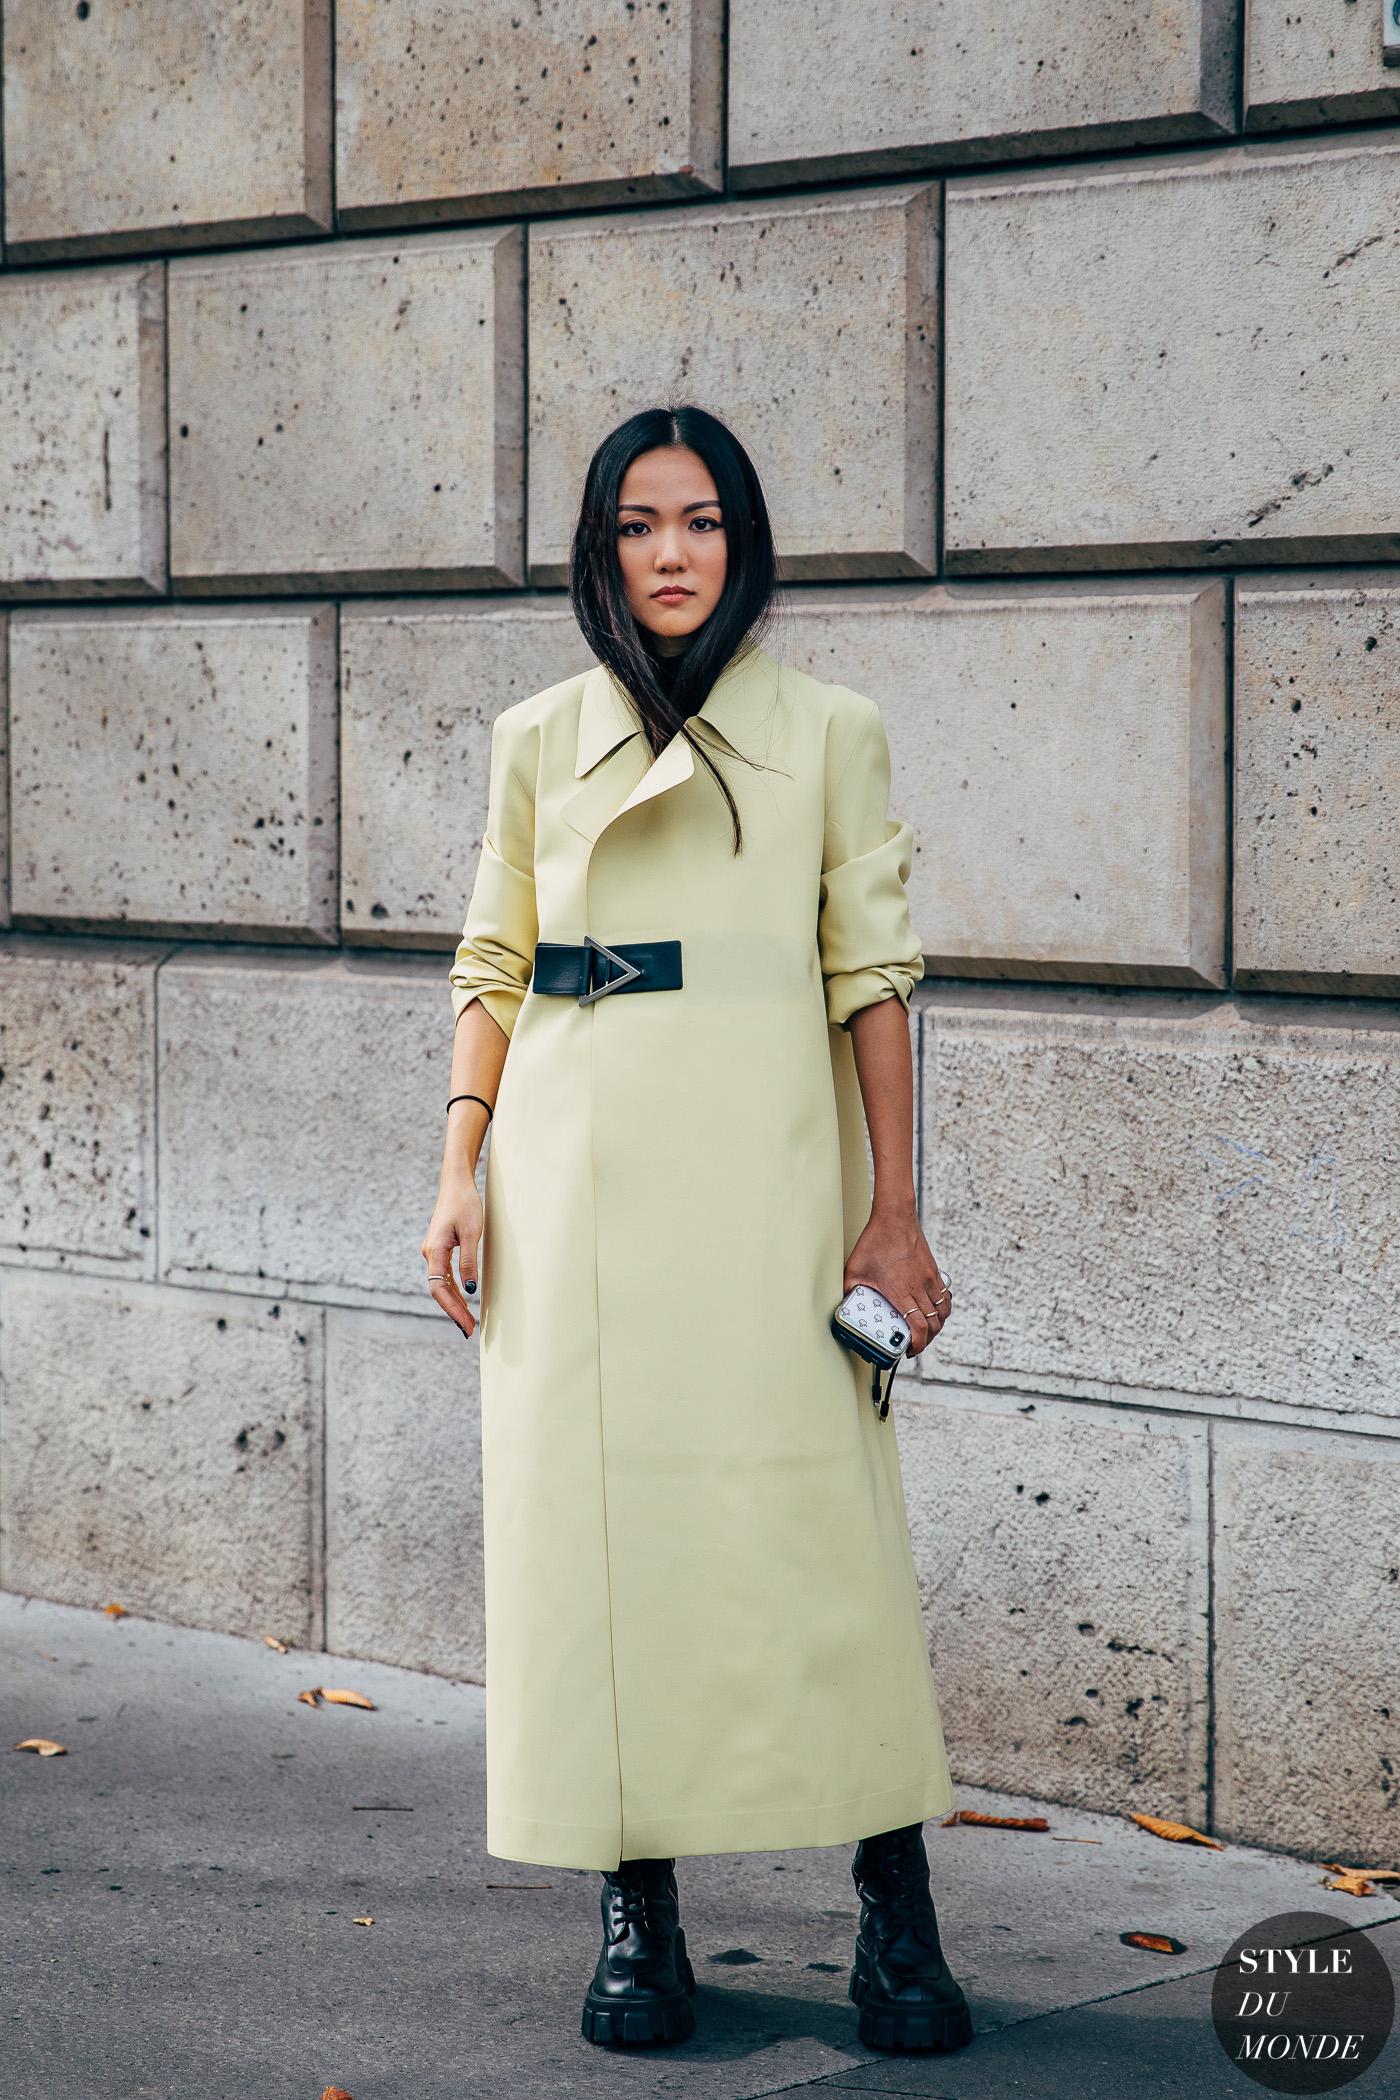 Paris SS 2020 Street Style: Yoyo Cao